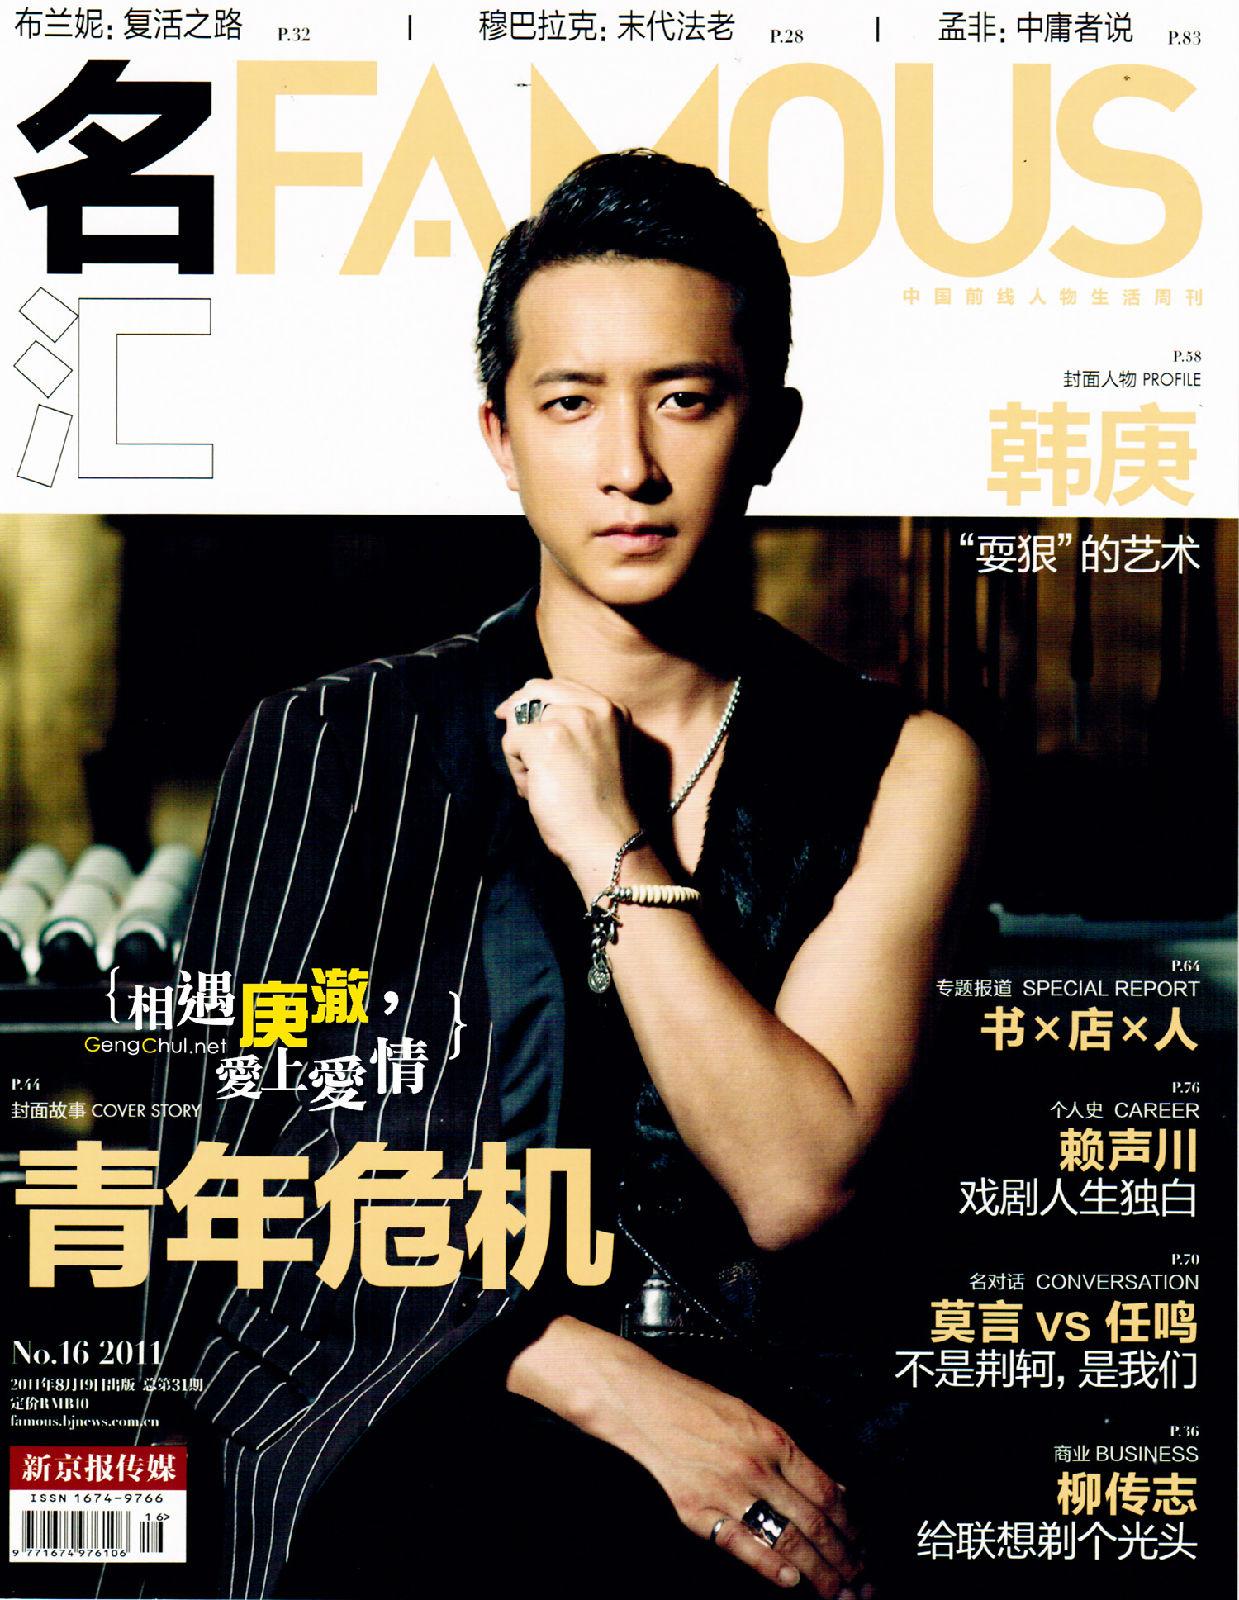 『meet庚澈』2011年8月刊『名汇famous』韩庚高清扫图